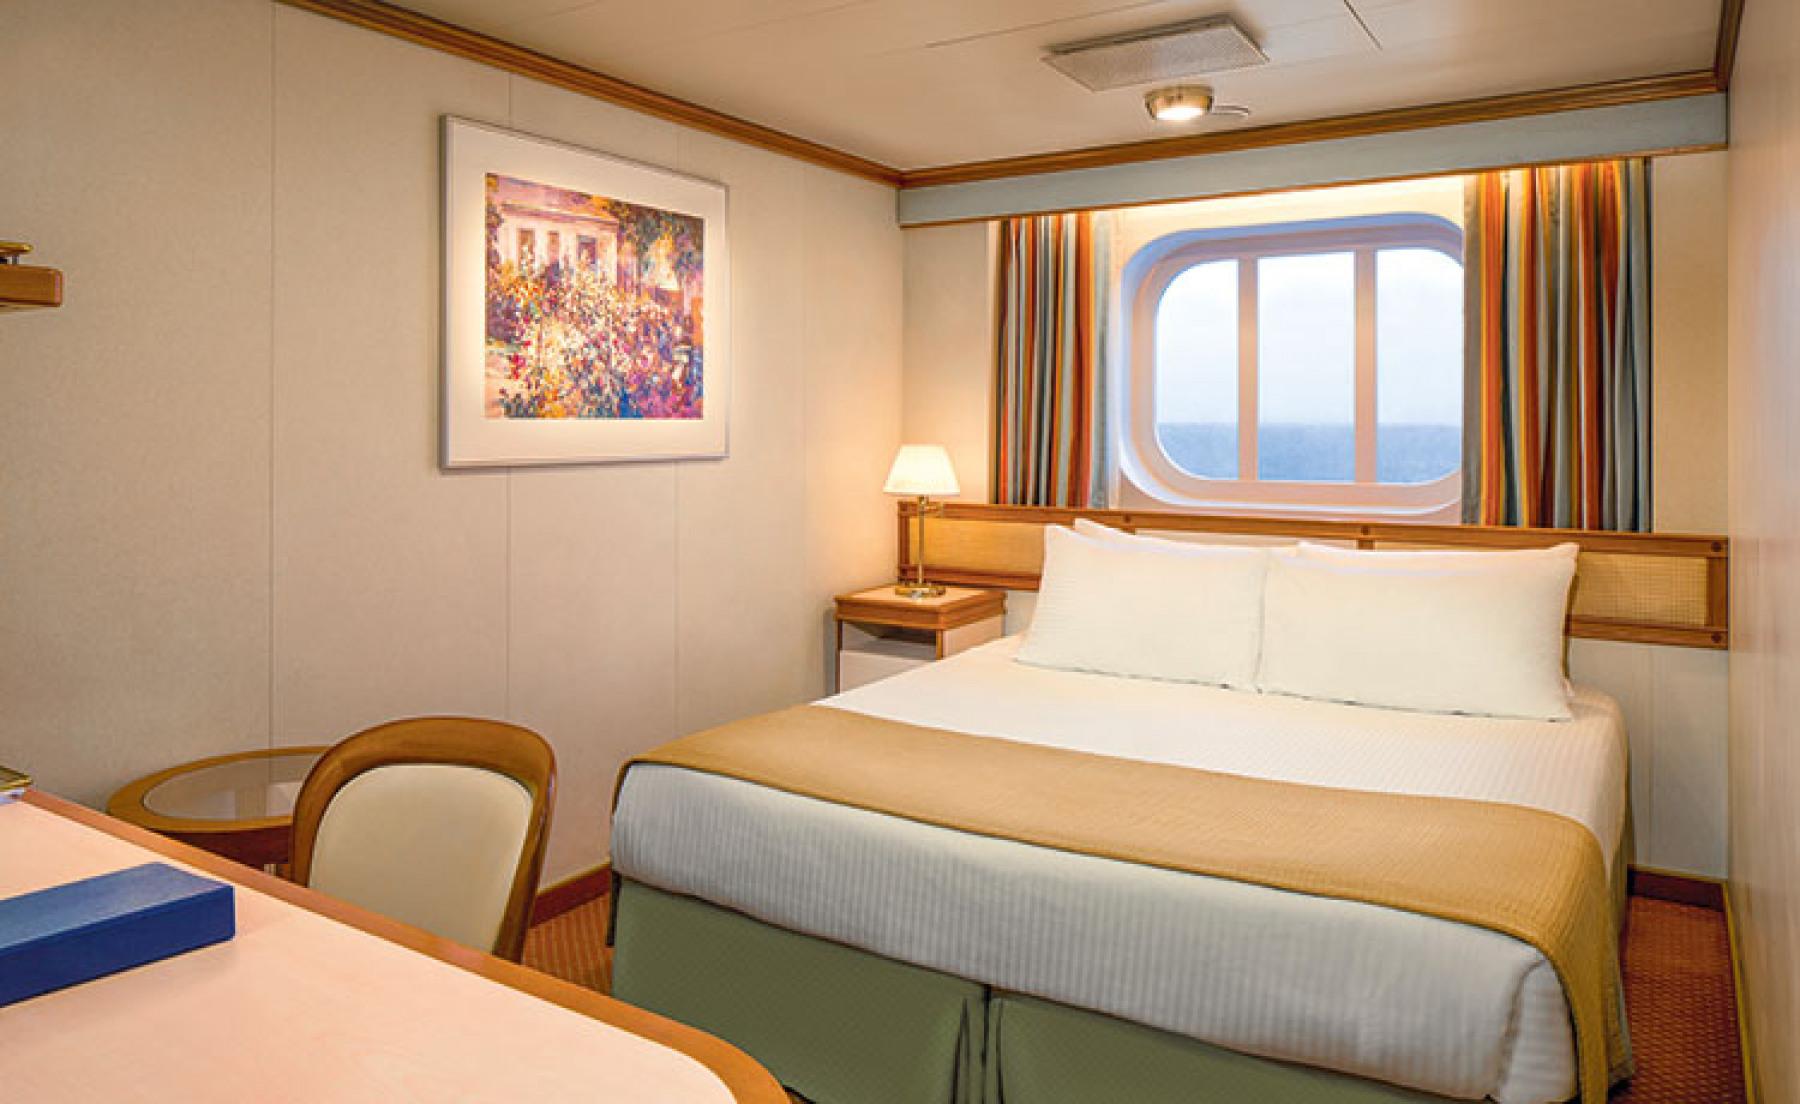 Princess Cruises Ruby Princess Accommodation Oceanview.jpg